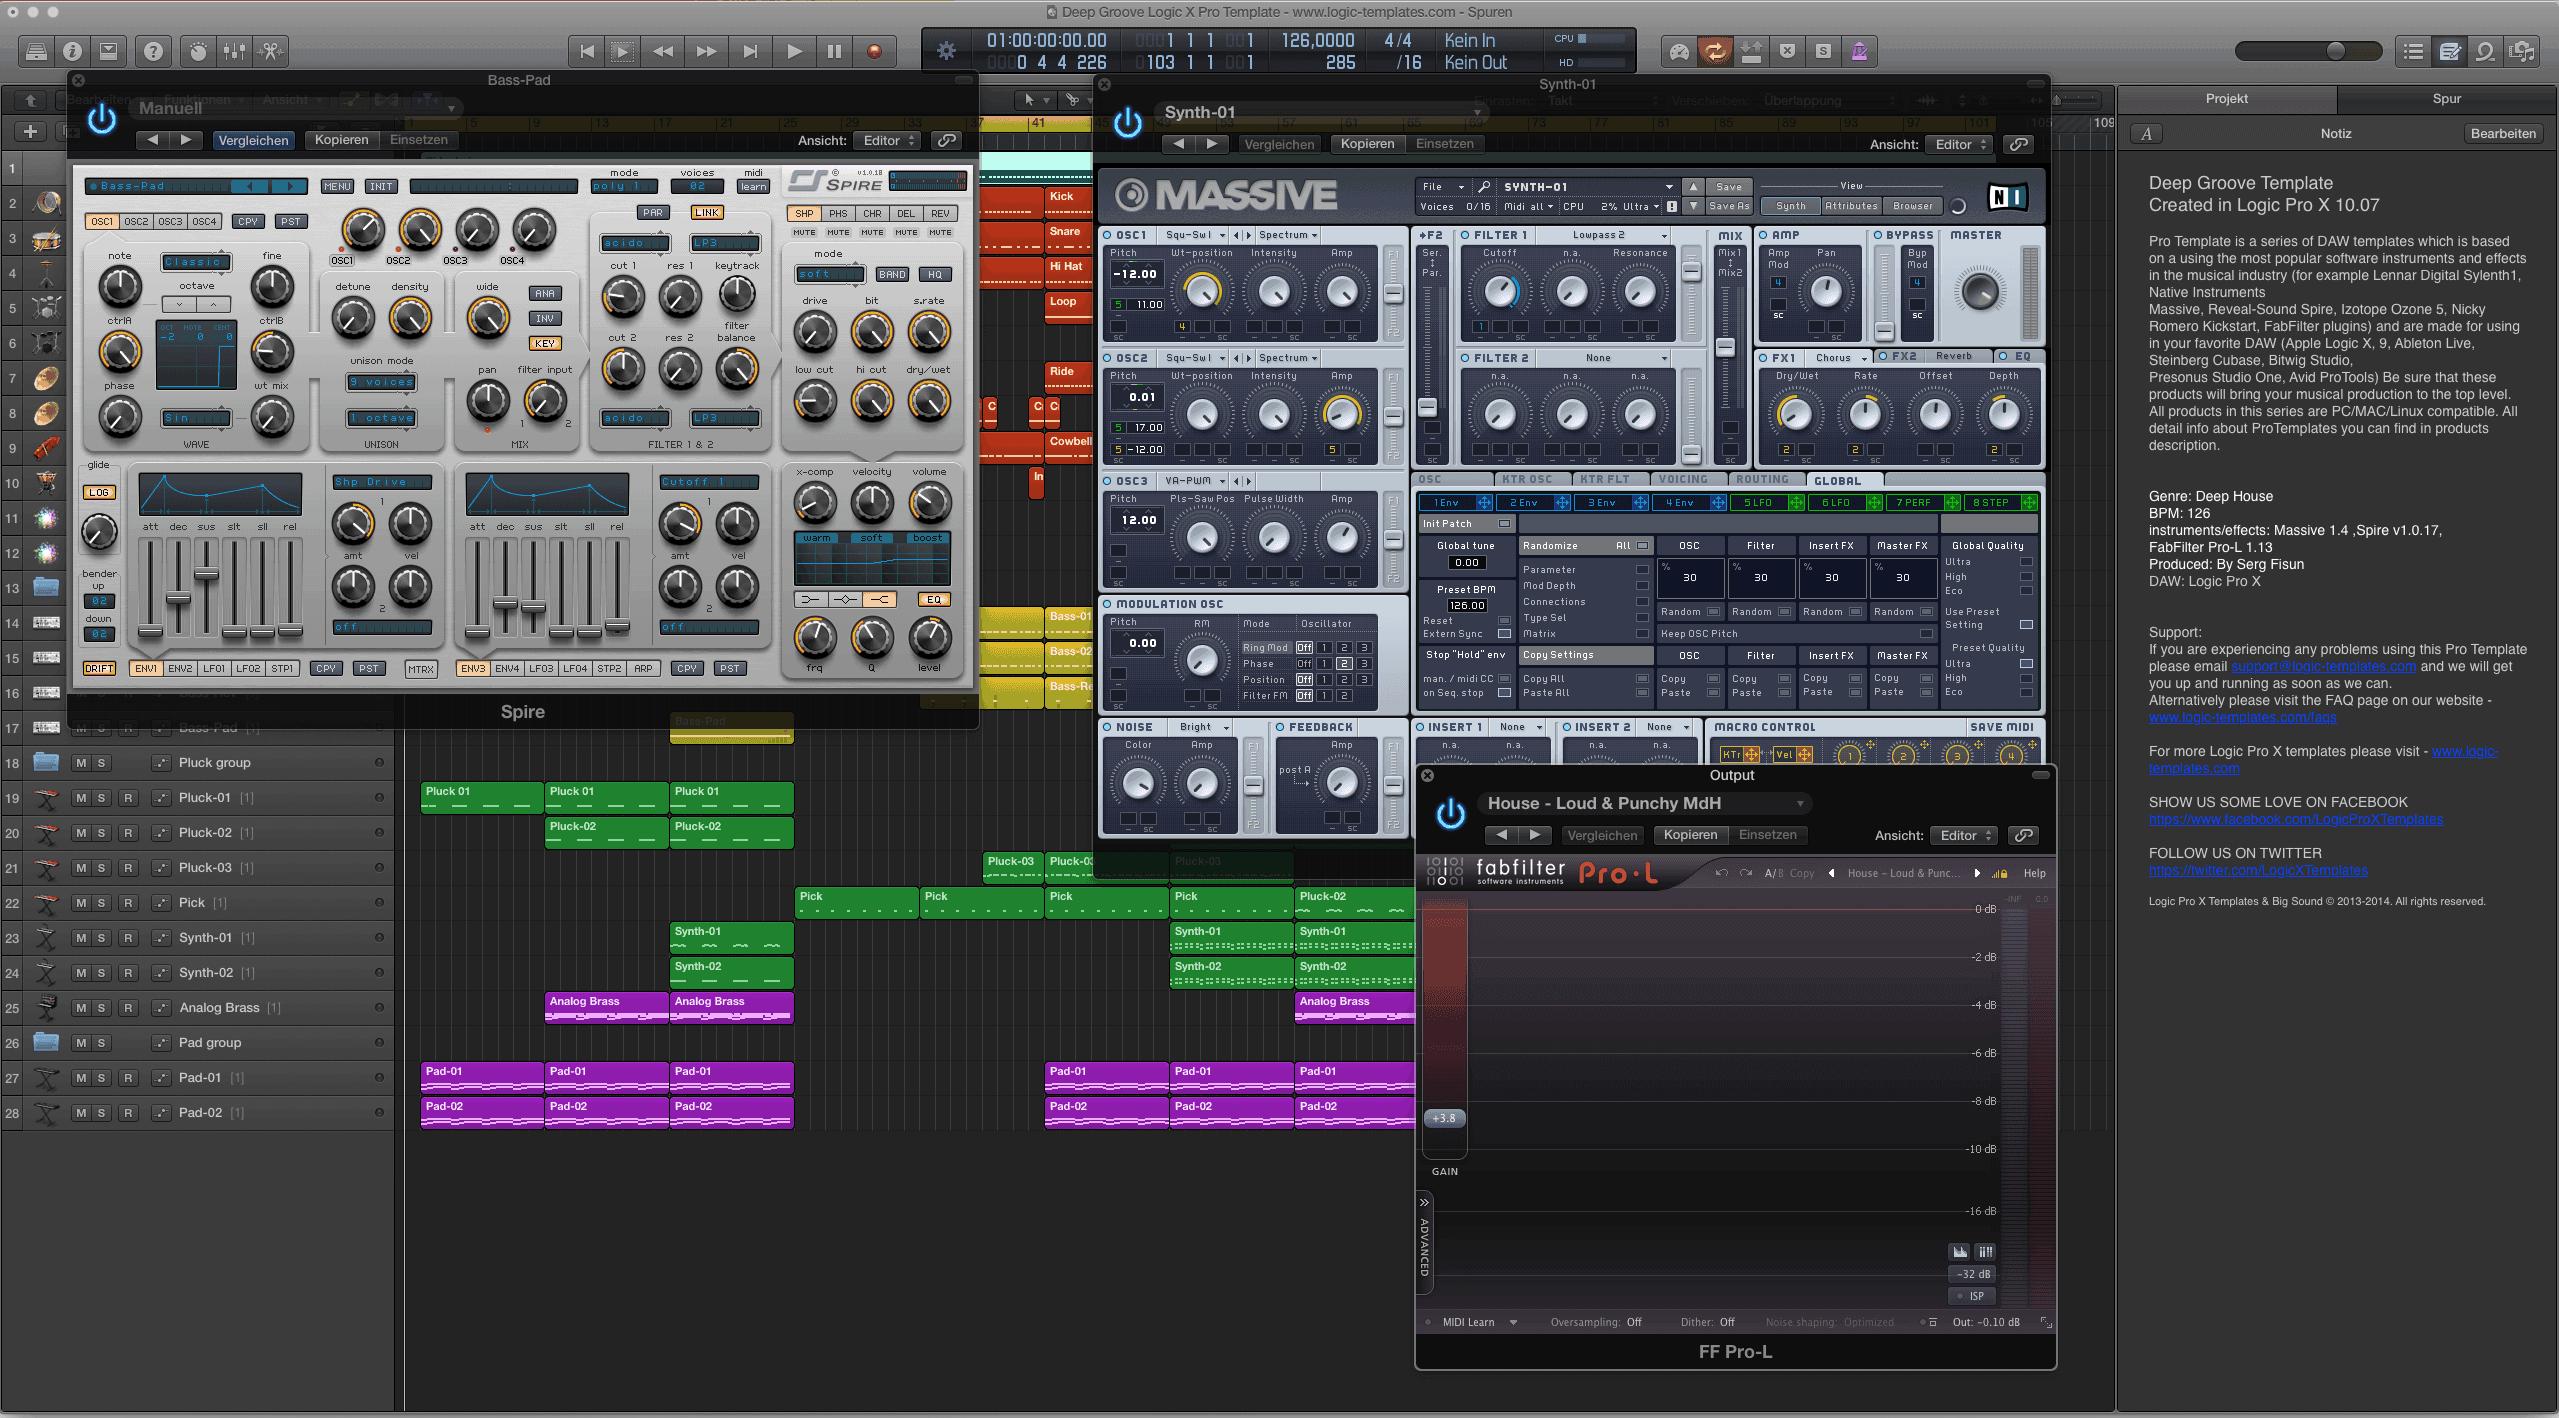 Deep Groove Logic X Pro Template 2